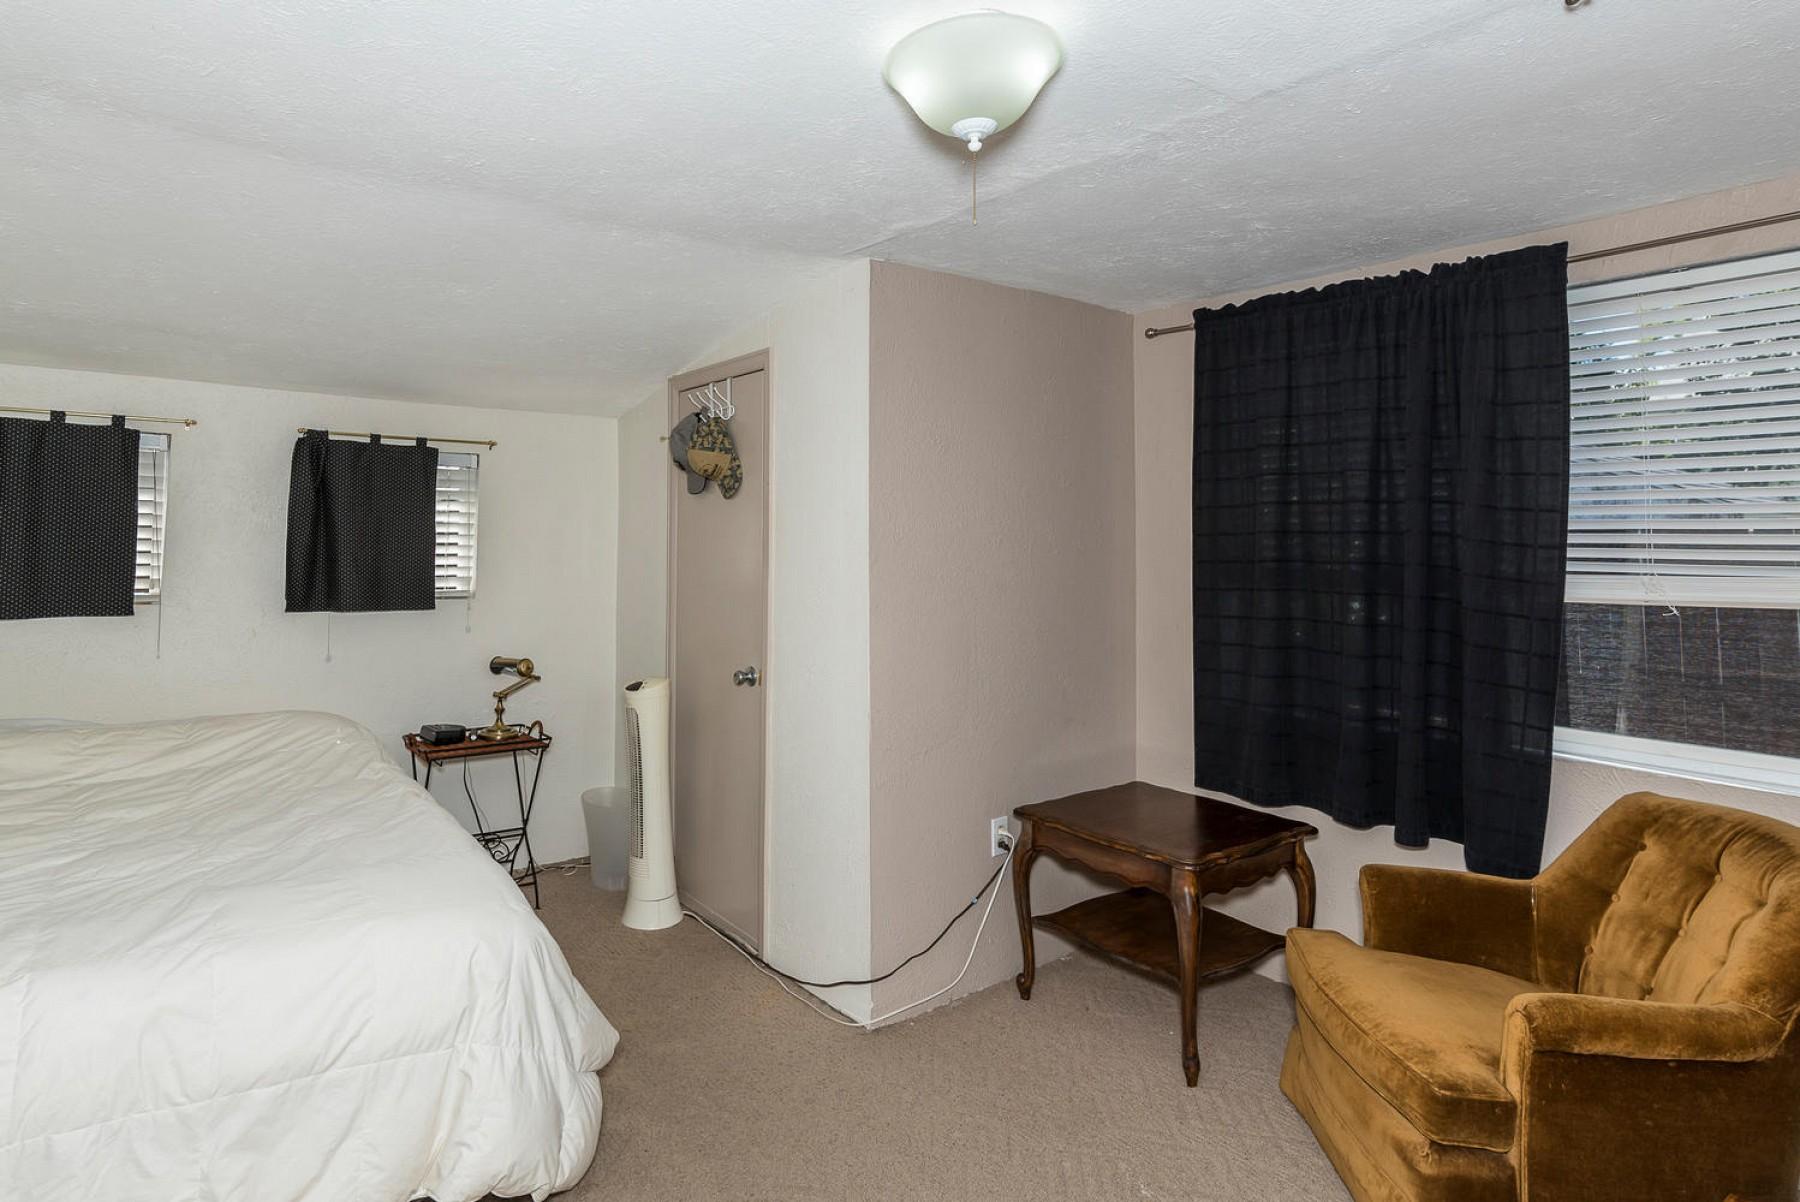 2832 S. Acoma Street, Englewood, CO 80110